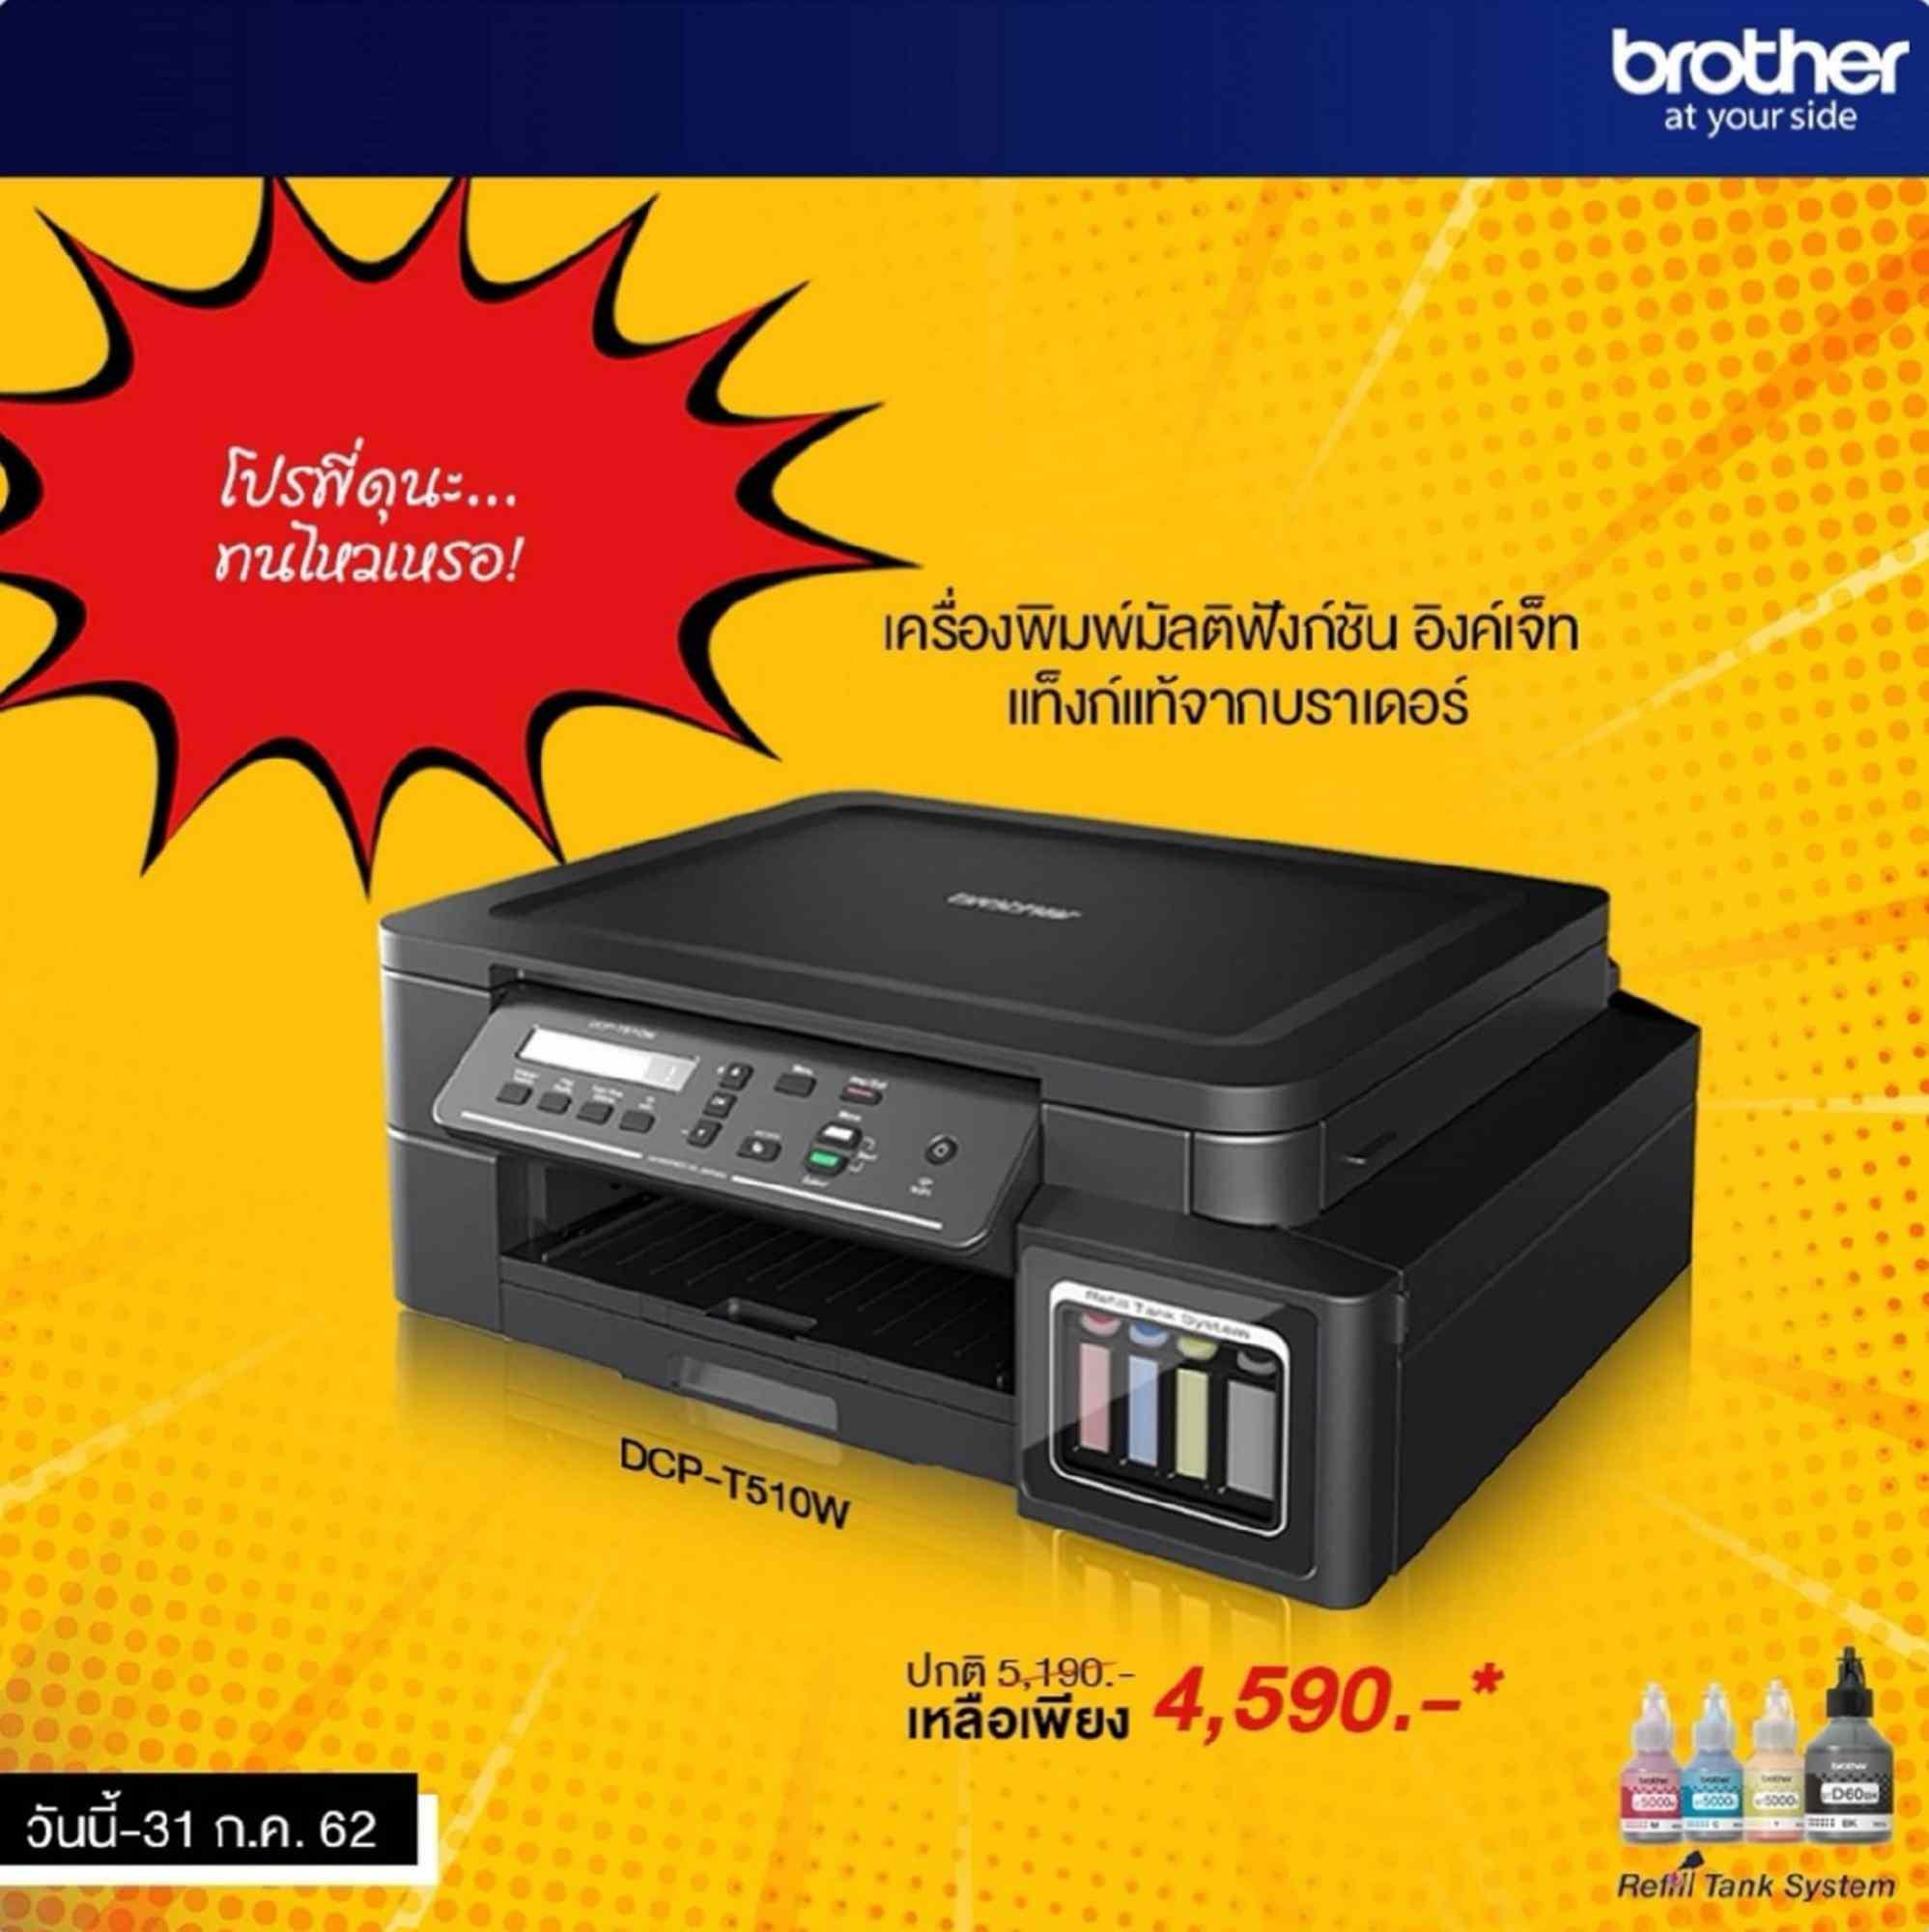 Brother จัดโปรสุดคุ้ม ให้คุณเป็นเจ้าของเครื่องพิมพ์มัลติฟังก์ชั่นอิงค์เจ็ทรุ่น DCP-T510W ในราคาพิเศษ 2